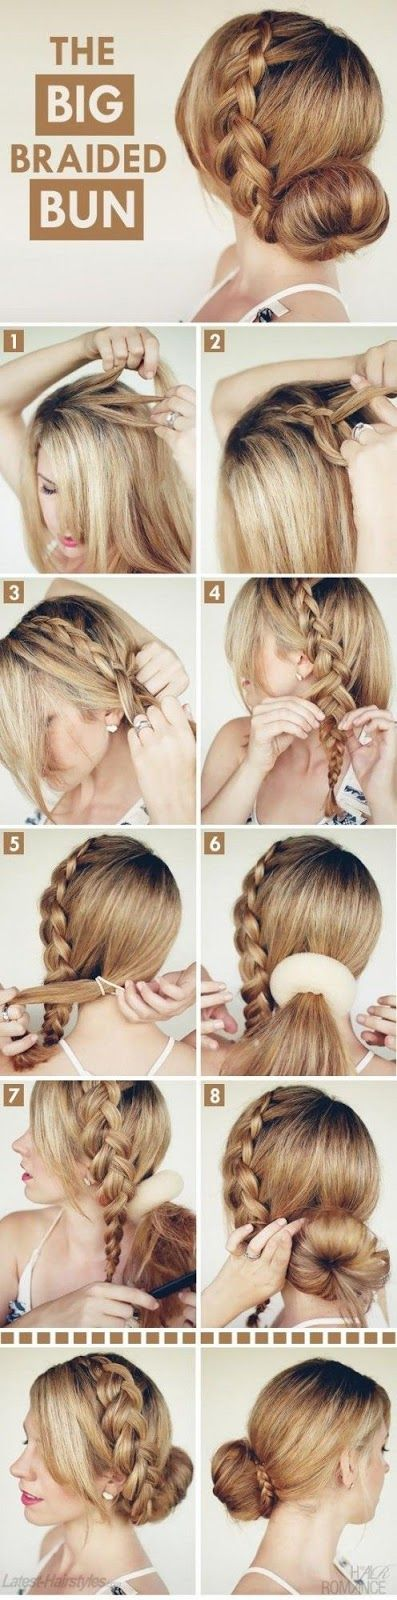 25 Must Try Summer Hair Bun, The Big Braided Bun | DIY Beauty Fashion